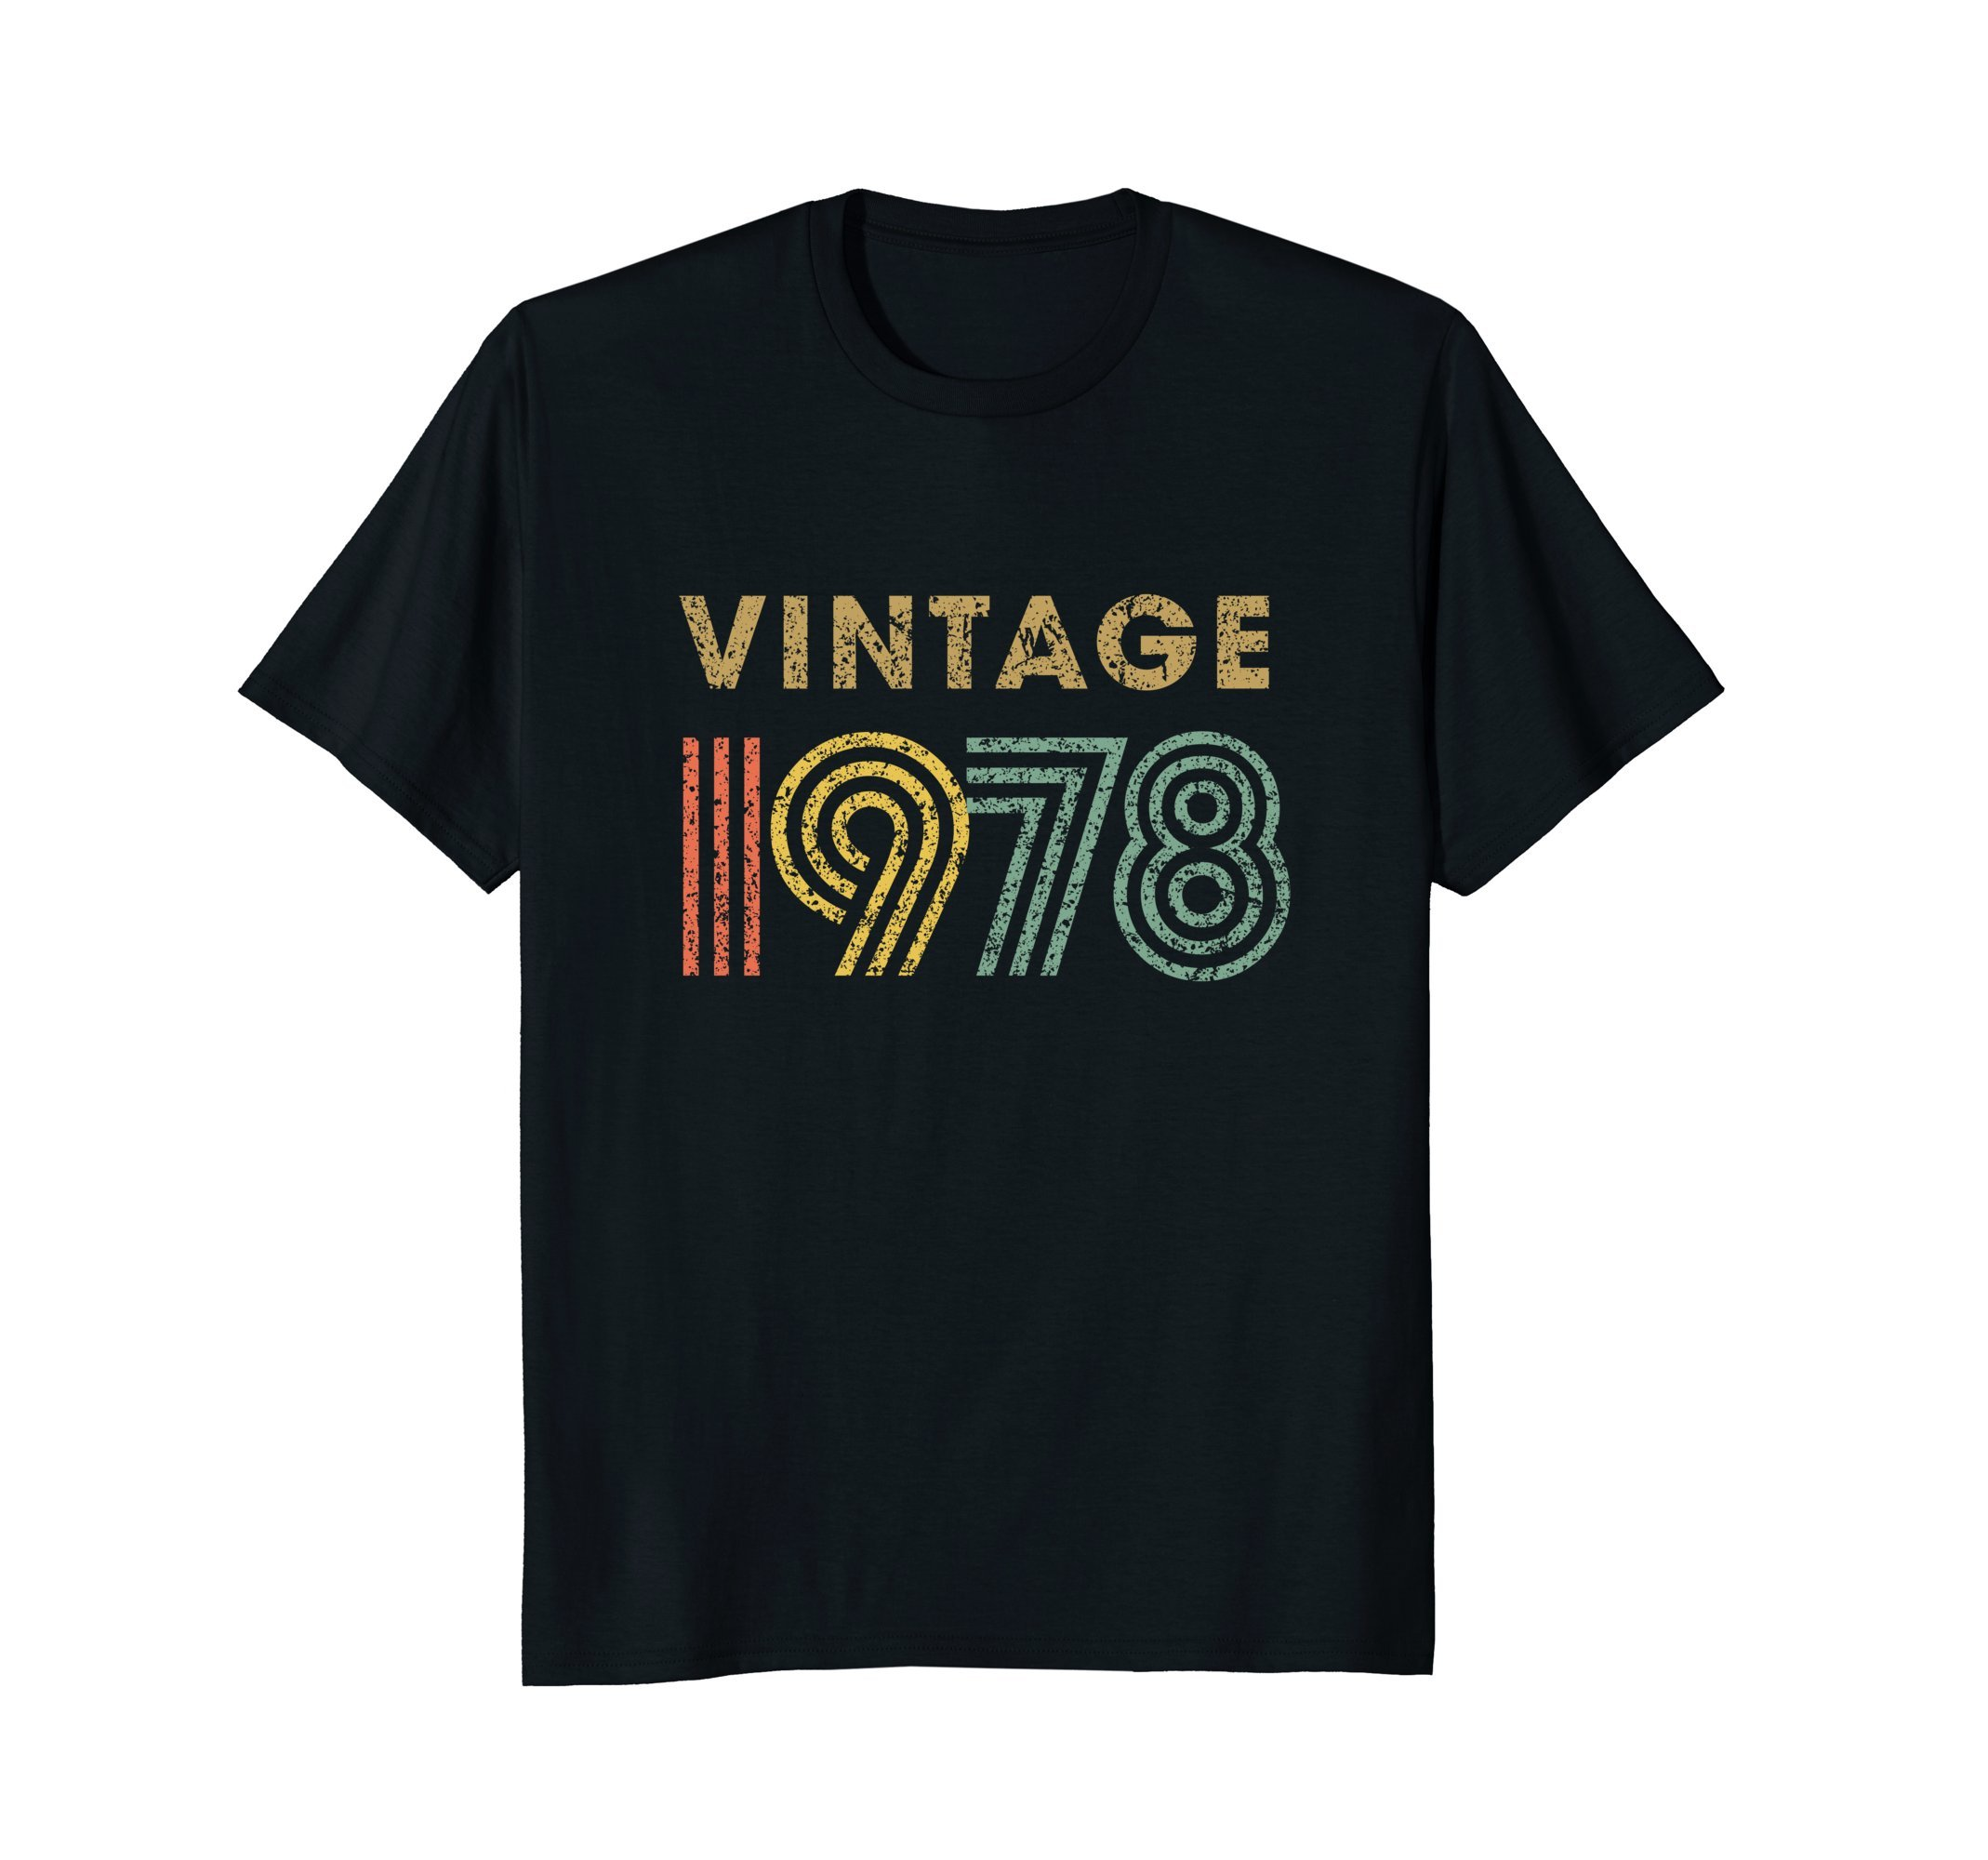 Vintage T-shirt Born in 1978 Retro 40th Birthday Gift